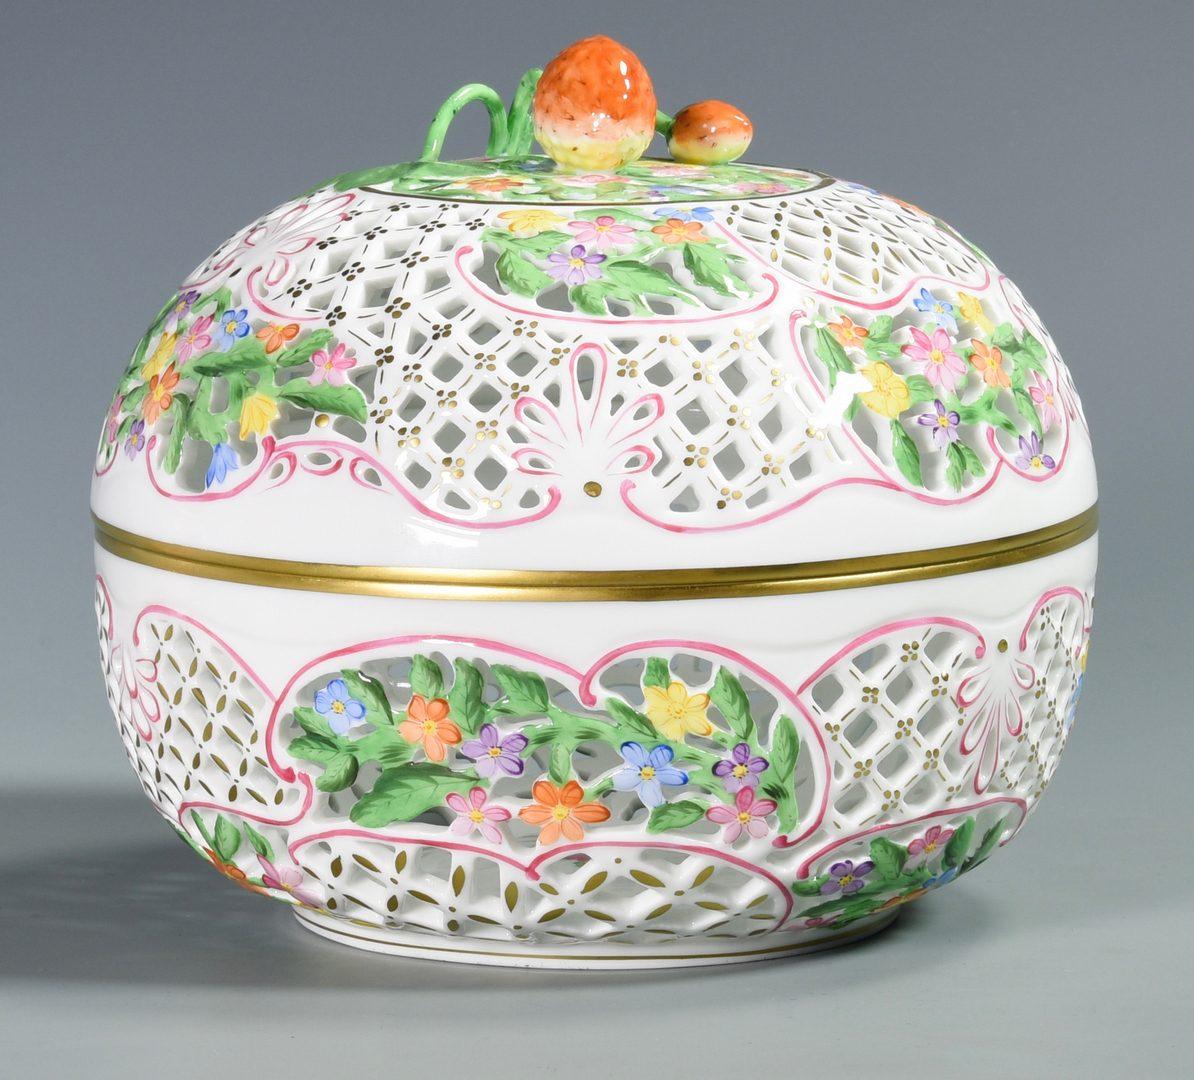 Lot 688: 4 Pcs. Herend Porcelain